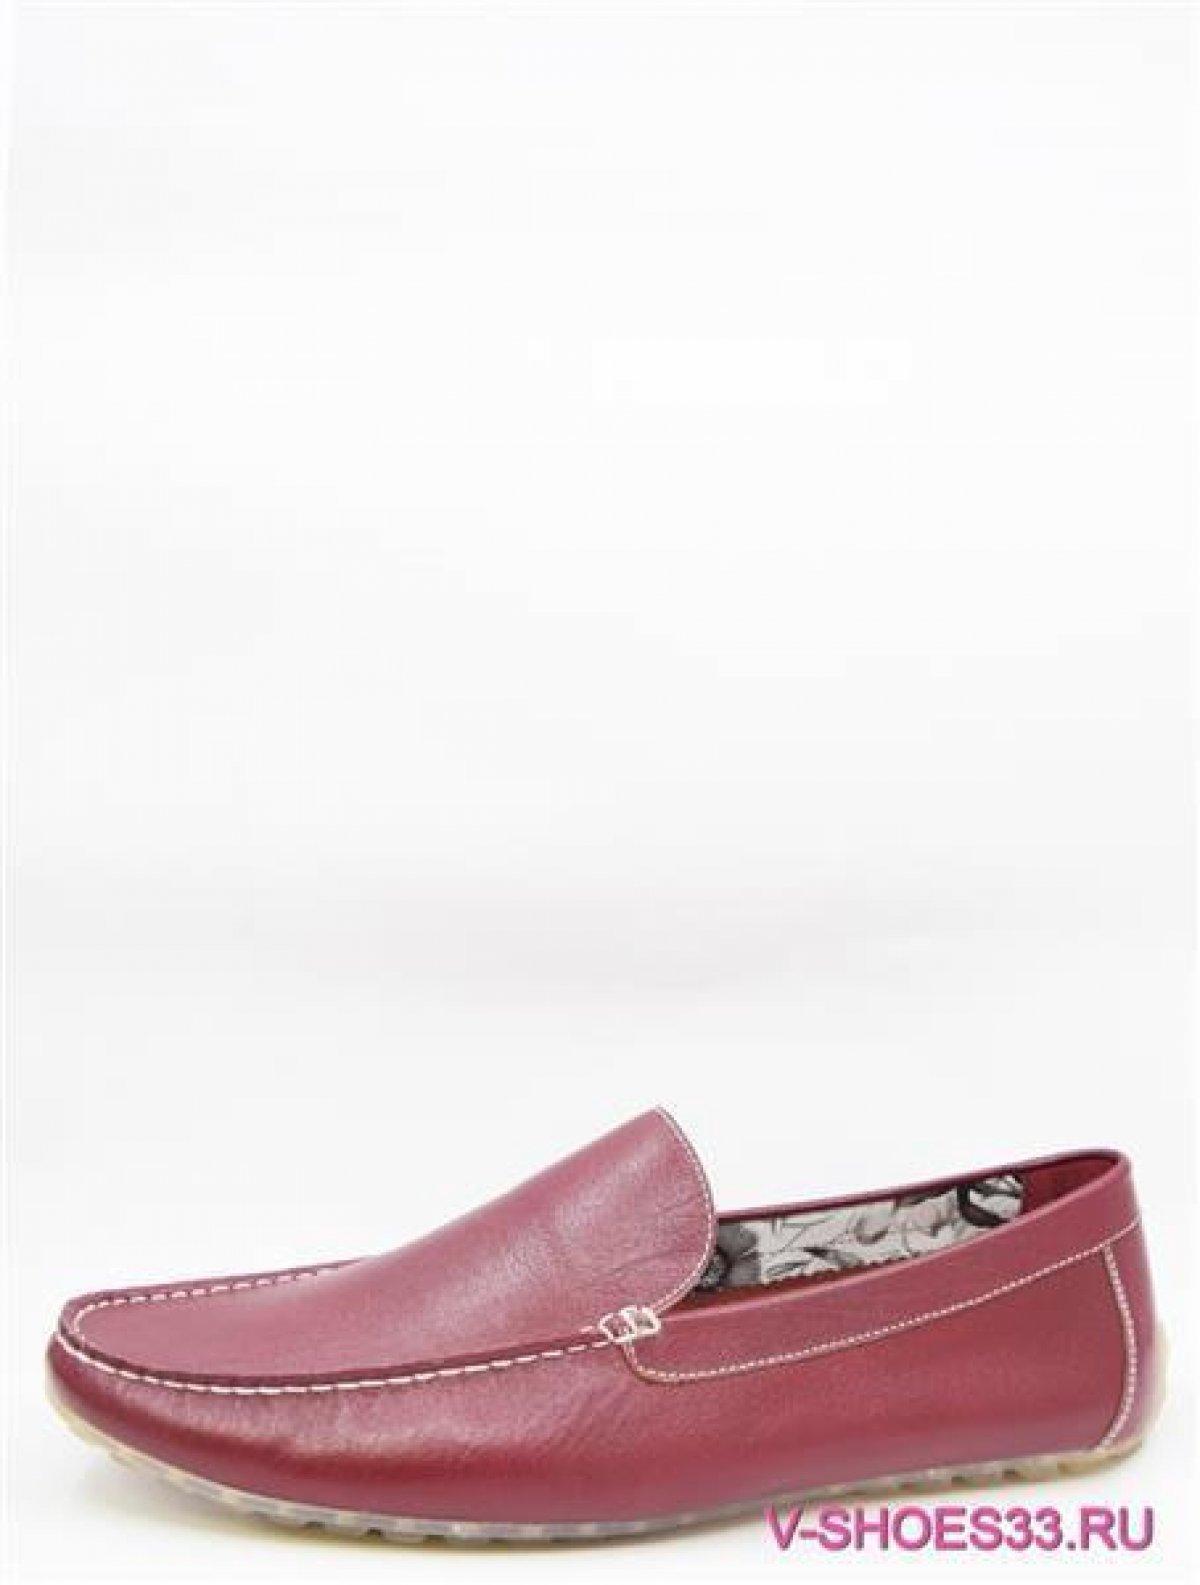 K87-075390 мужские туфли